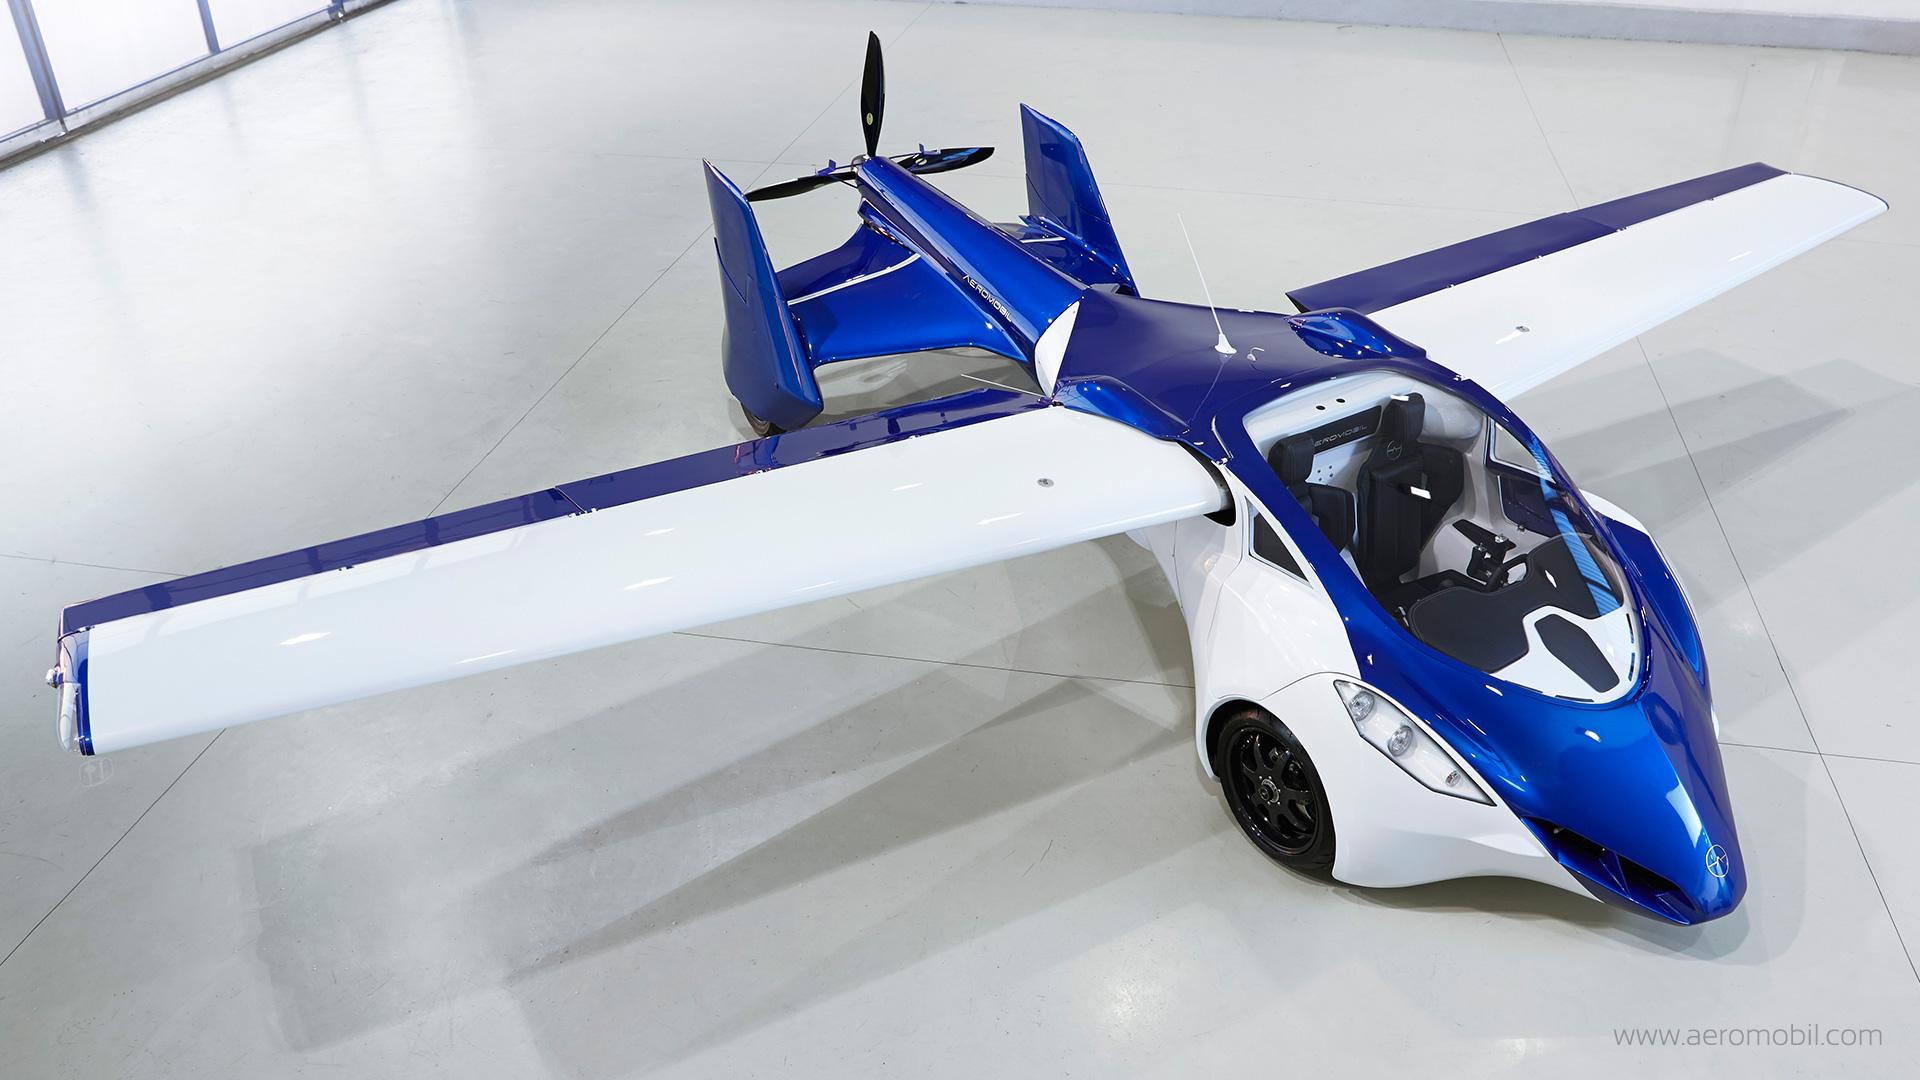 6 flying cars that let you soar over traffic